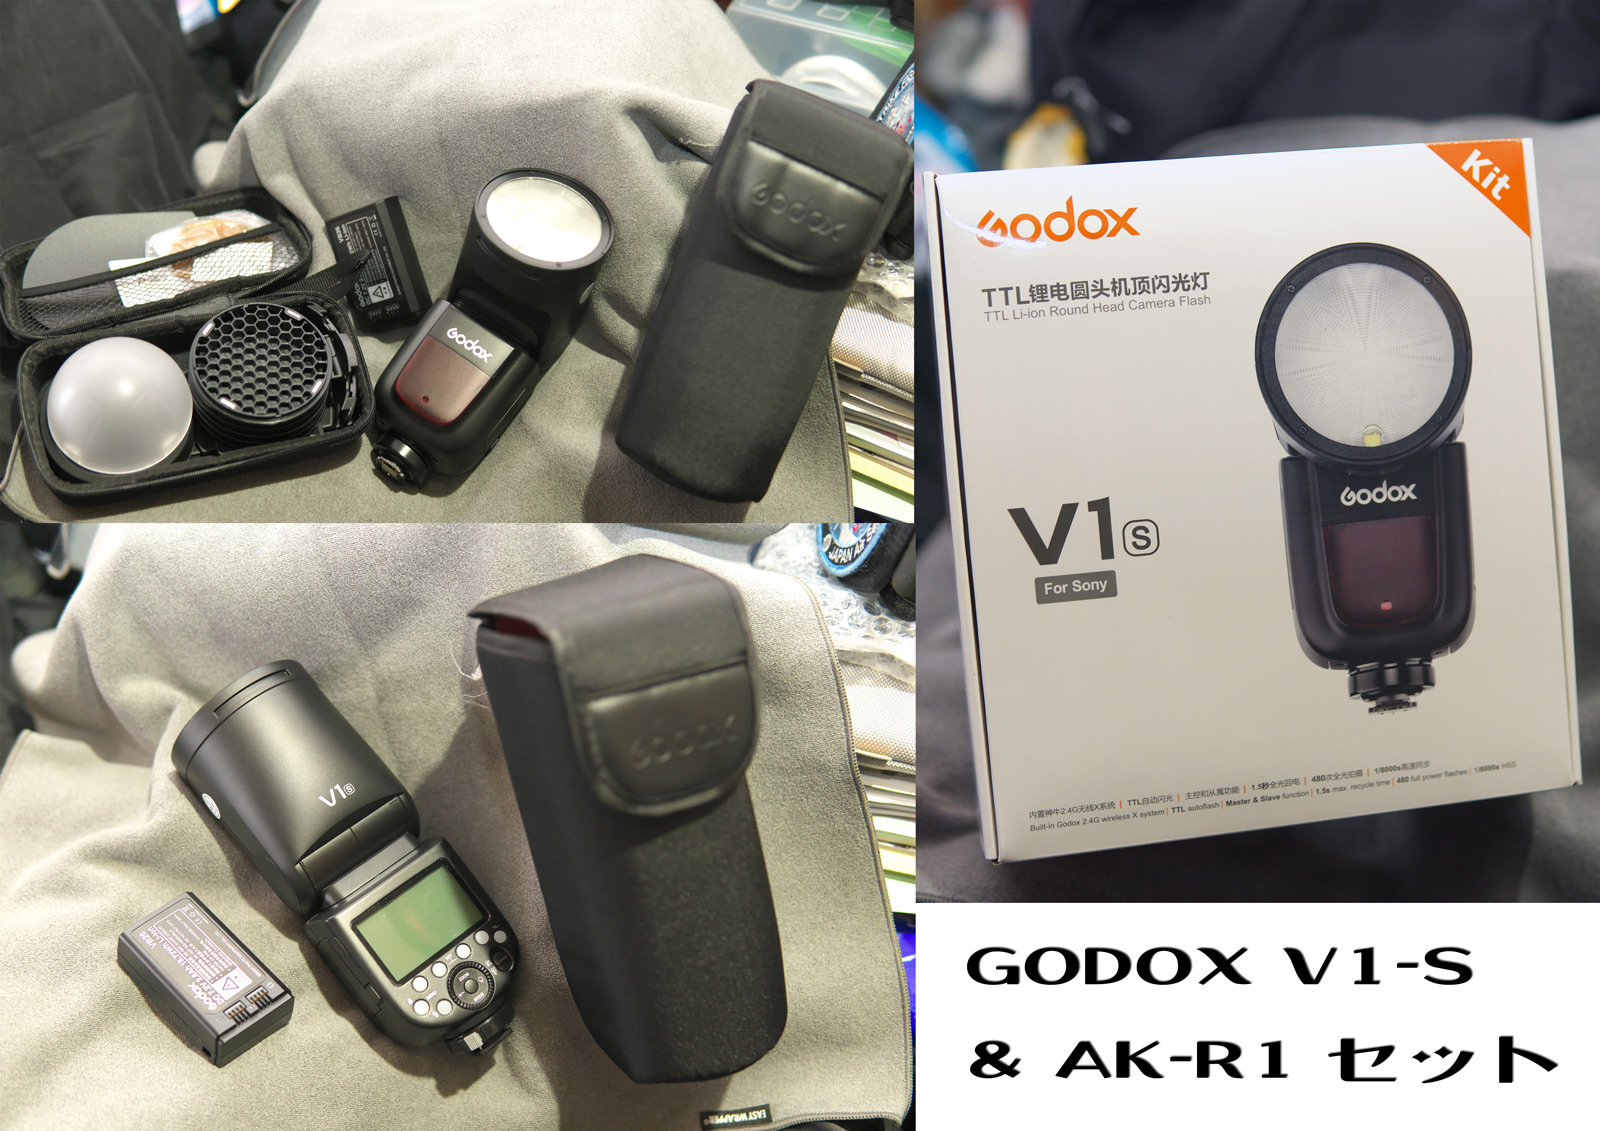 GODOX V1-S_a0271402_09271587.jpg